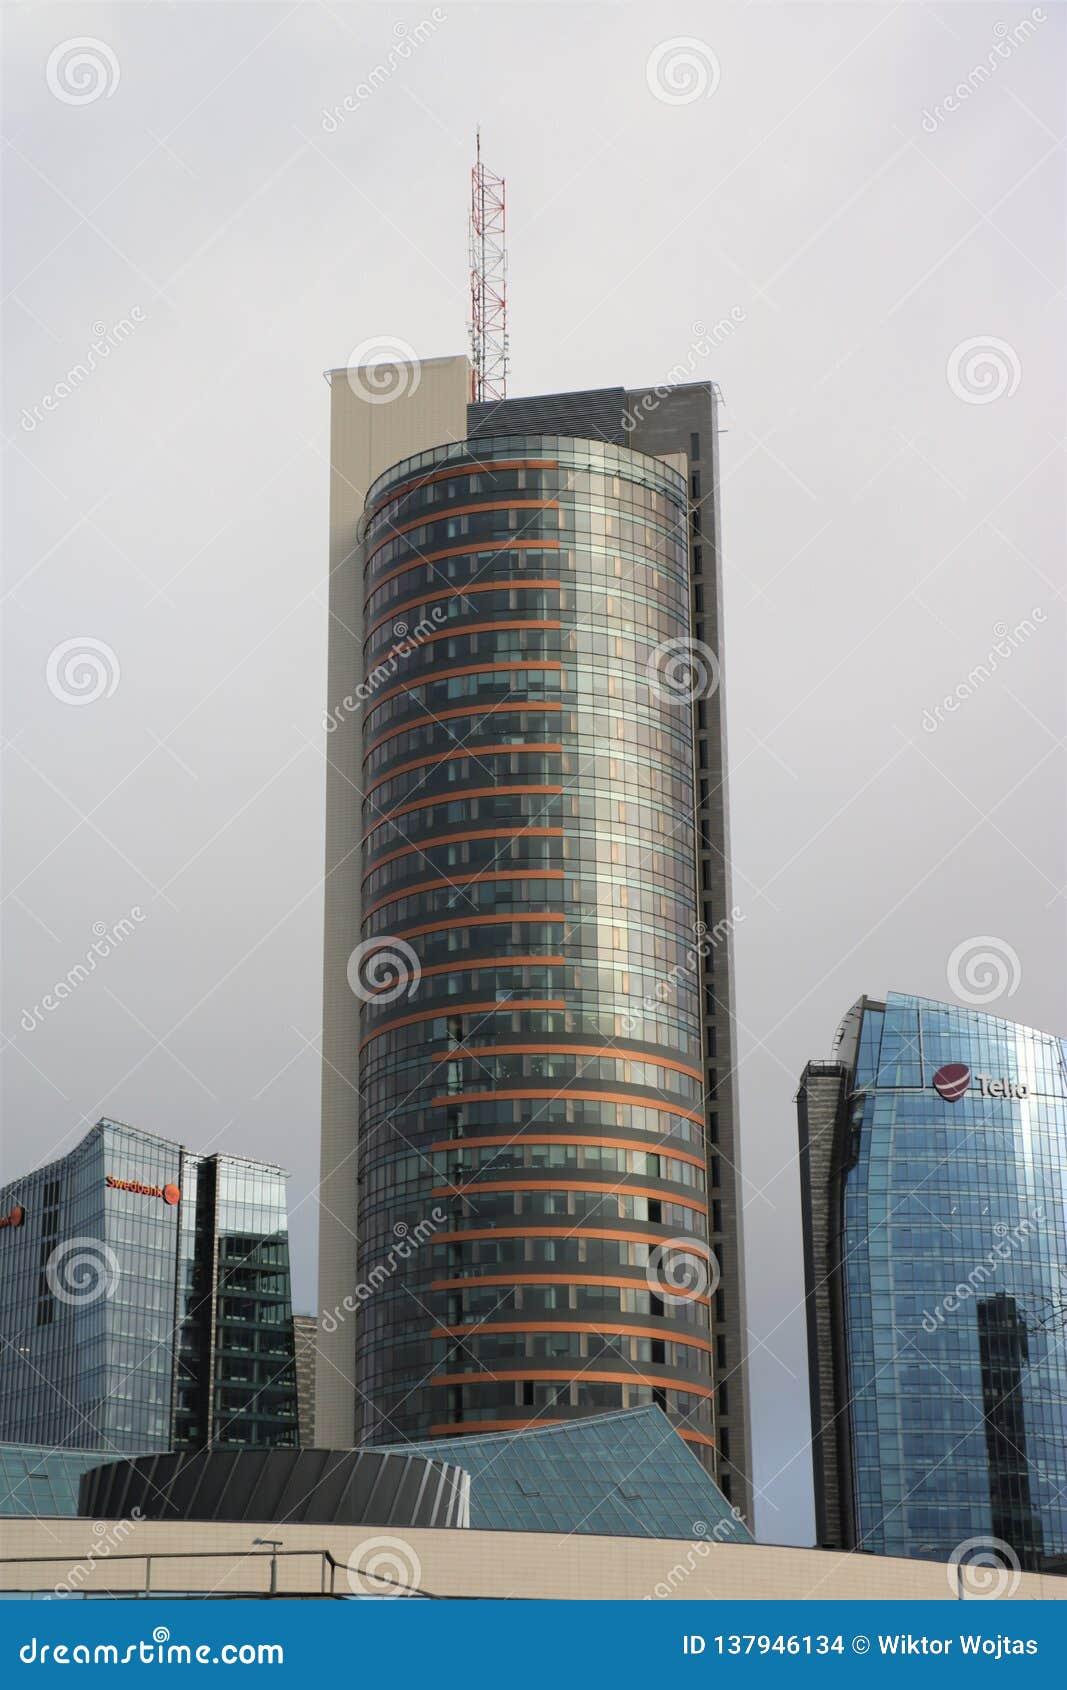 Torre di europa, Vilnius, Lituania